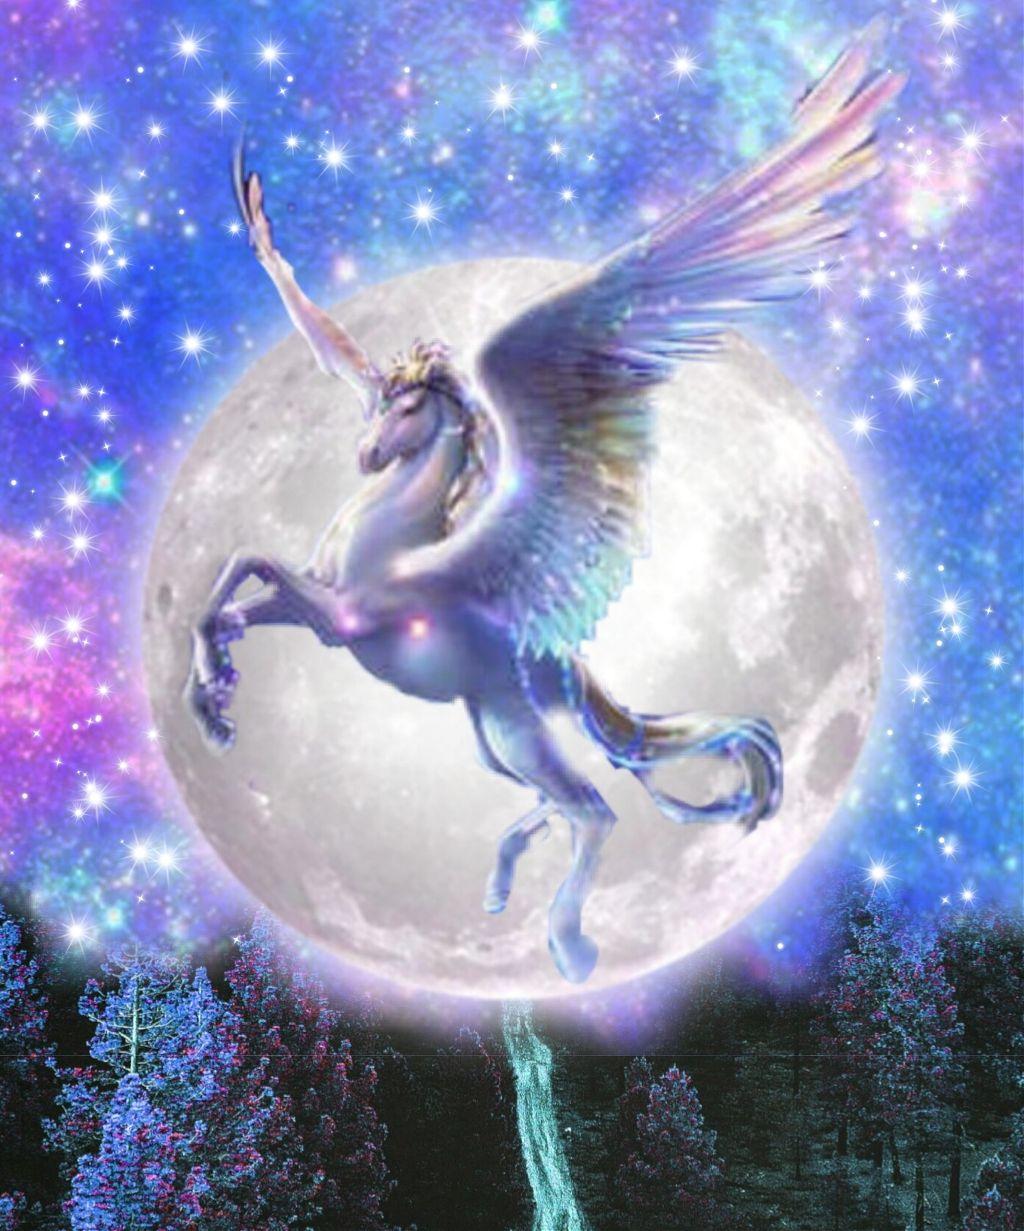 Moon&horse